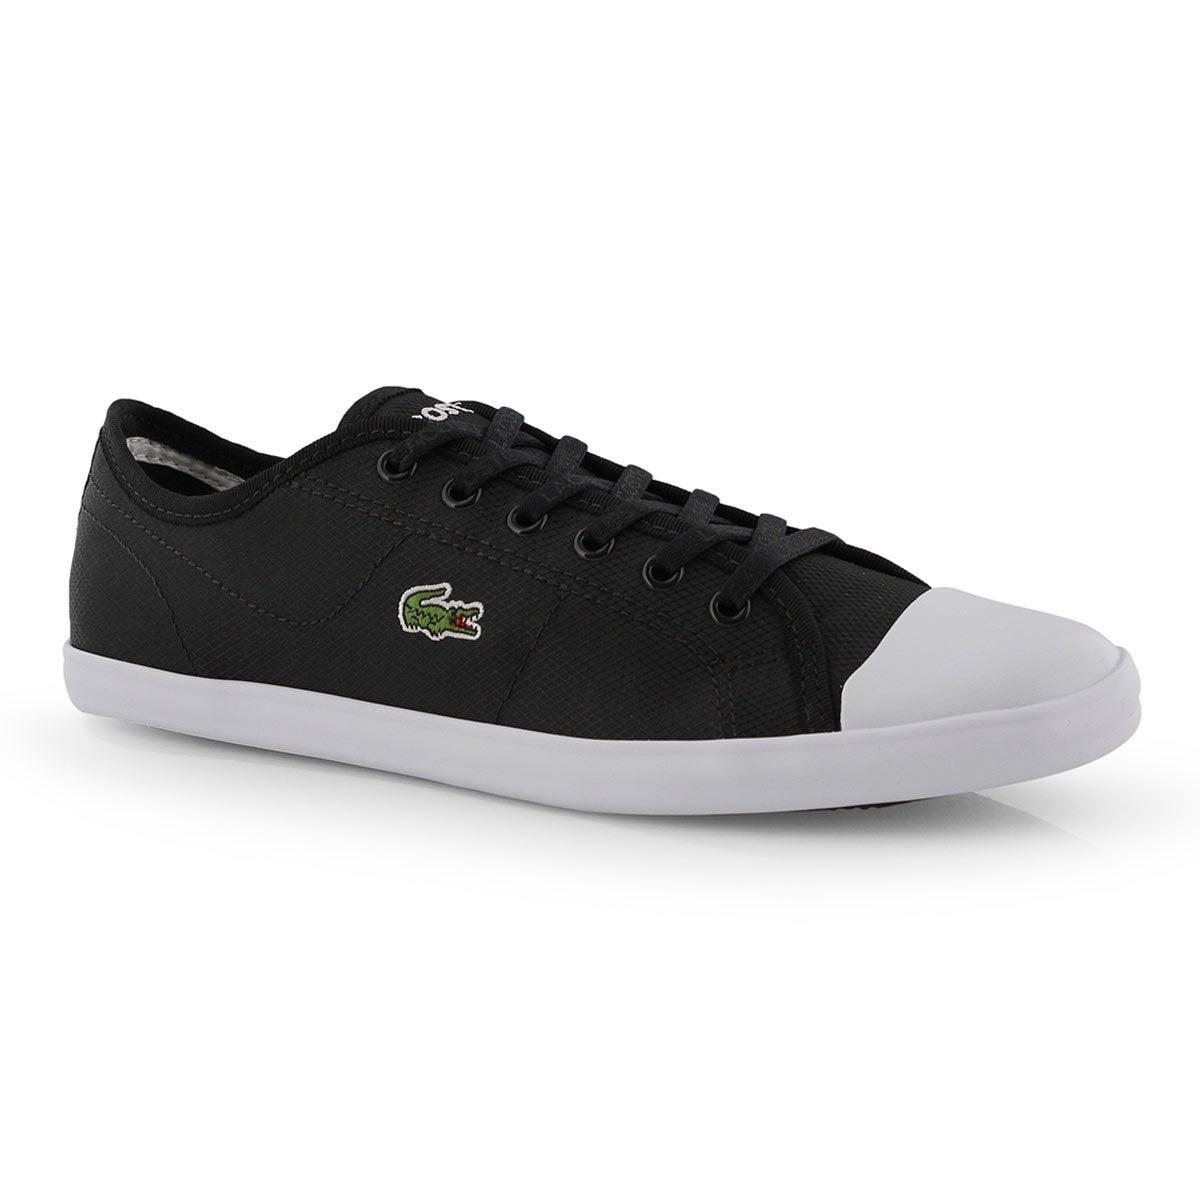 Lds Ziane Sneaker119 1 blk/wht lace up